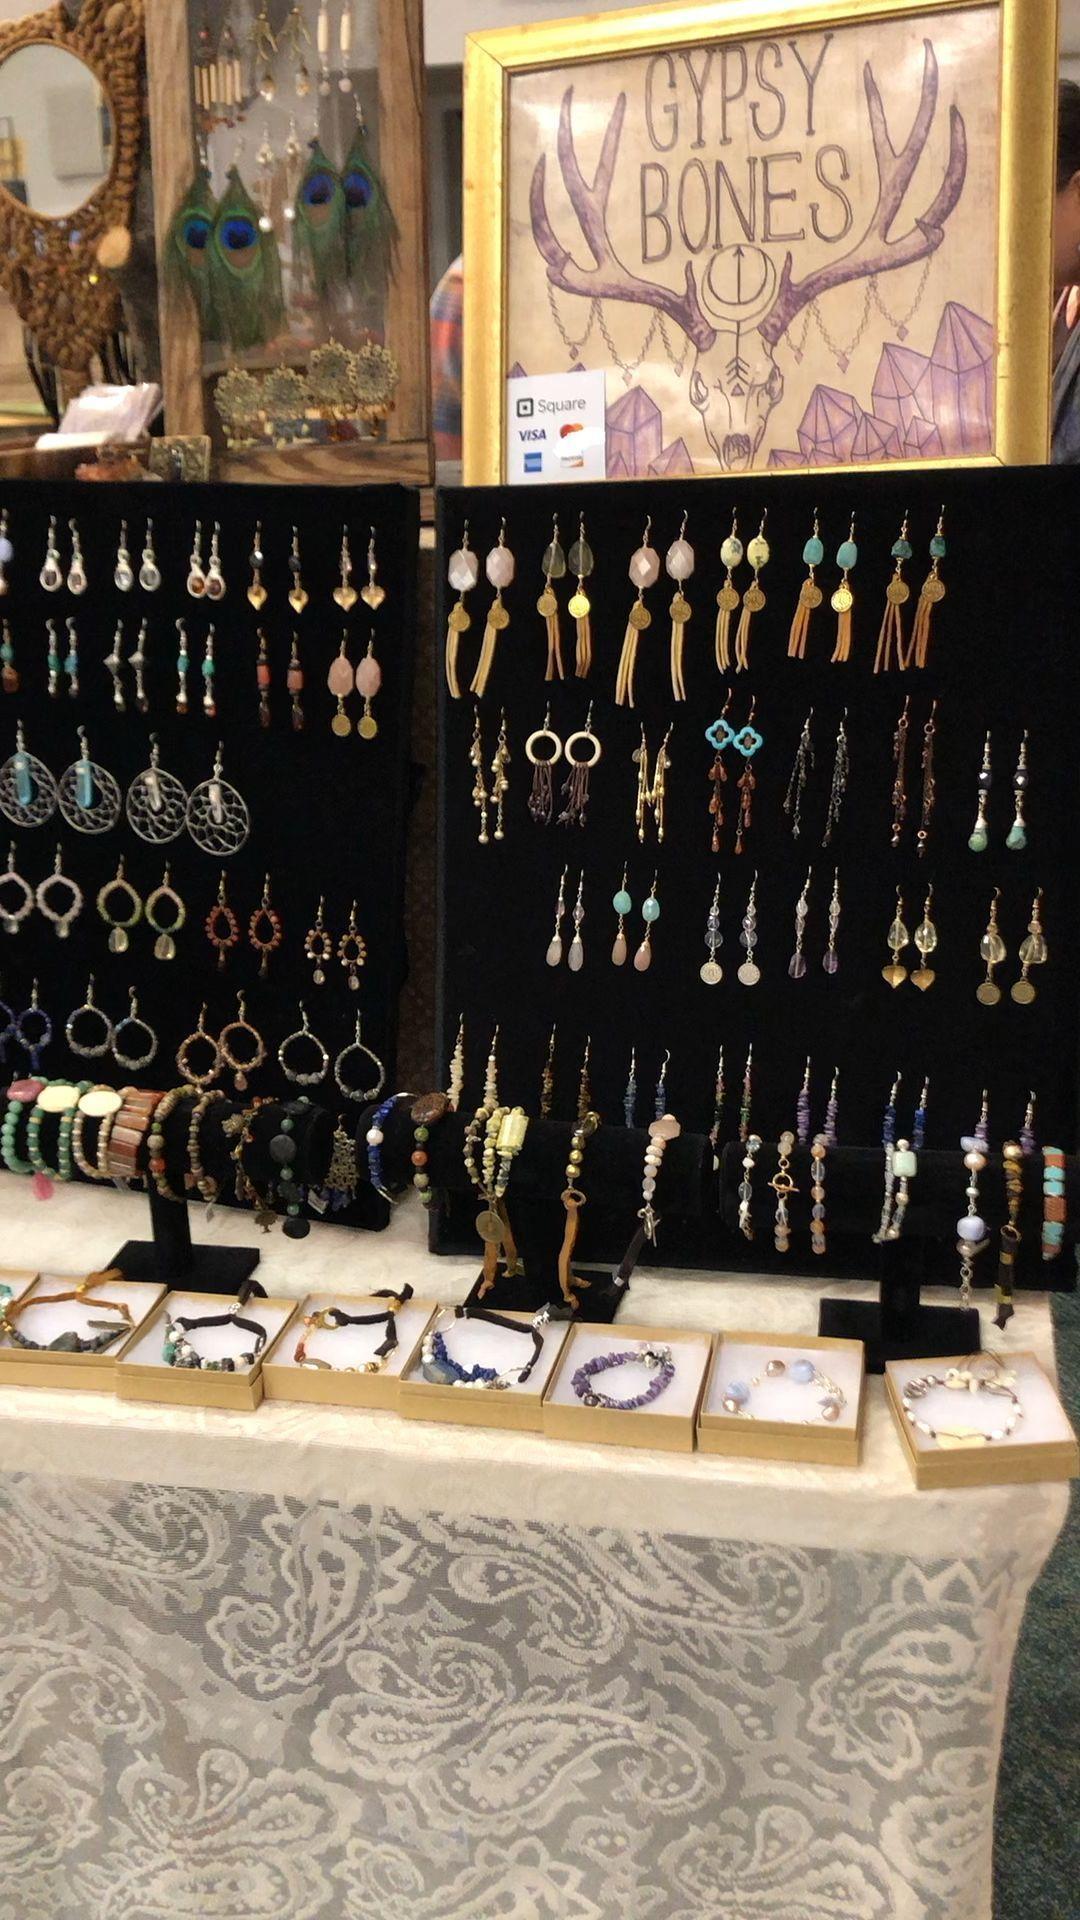 Gypsy Bones Jewelry Display #gypsysetup Here is my jewelry display setup for the...#bones #display #gypsy #gypsysetup #jewelry #setup